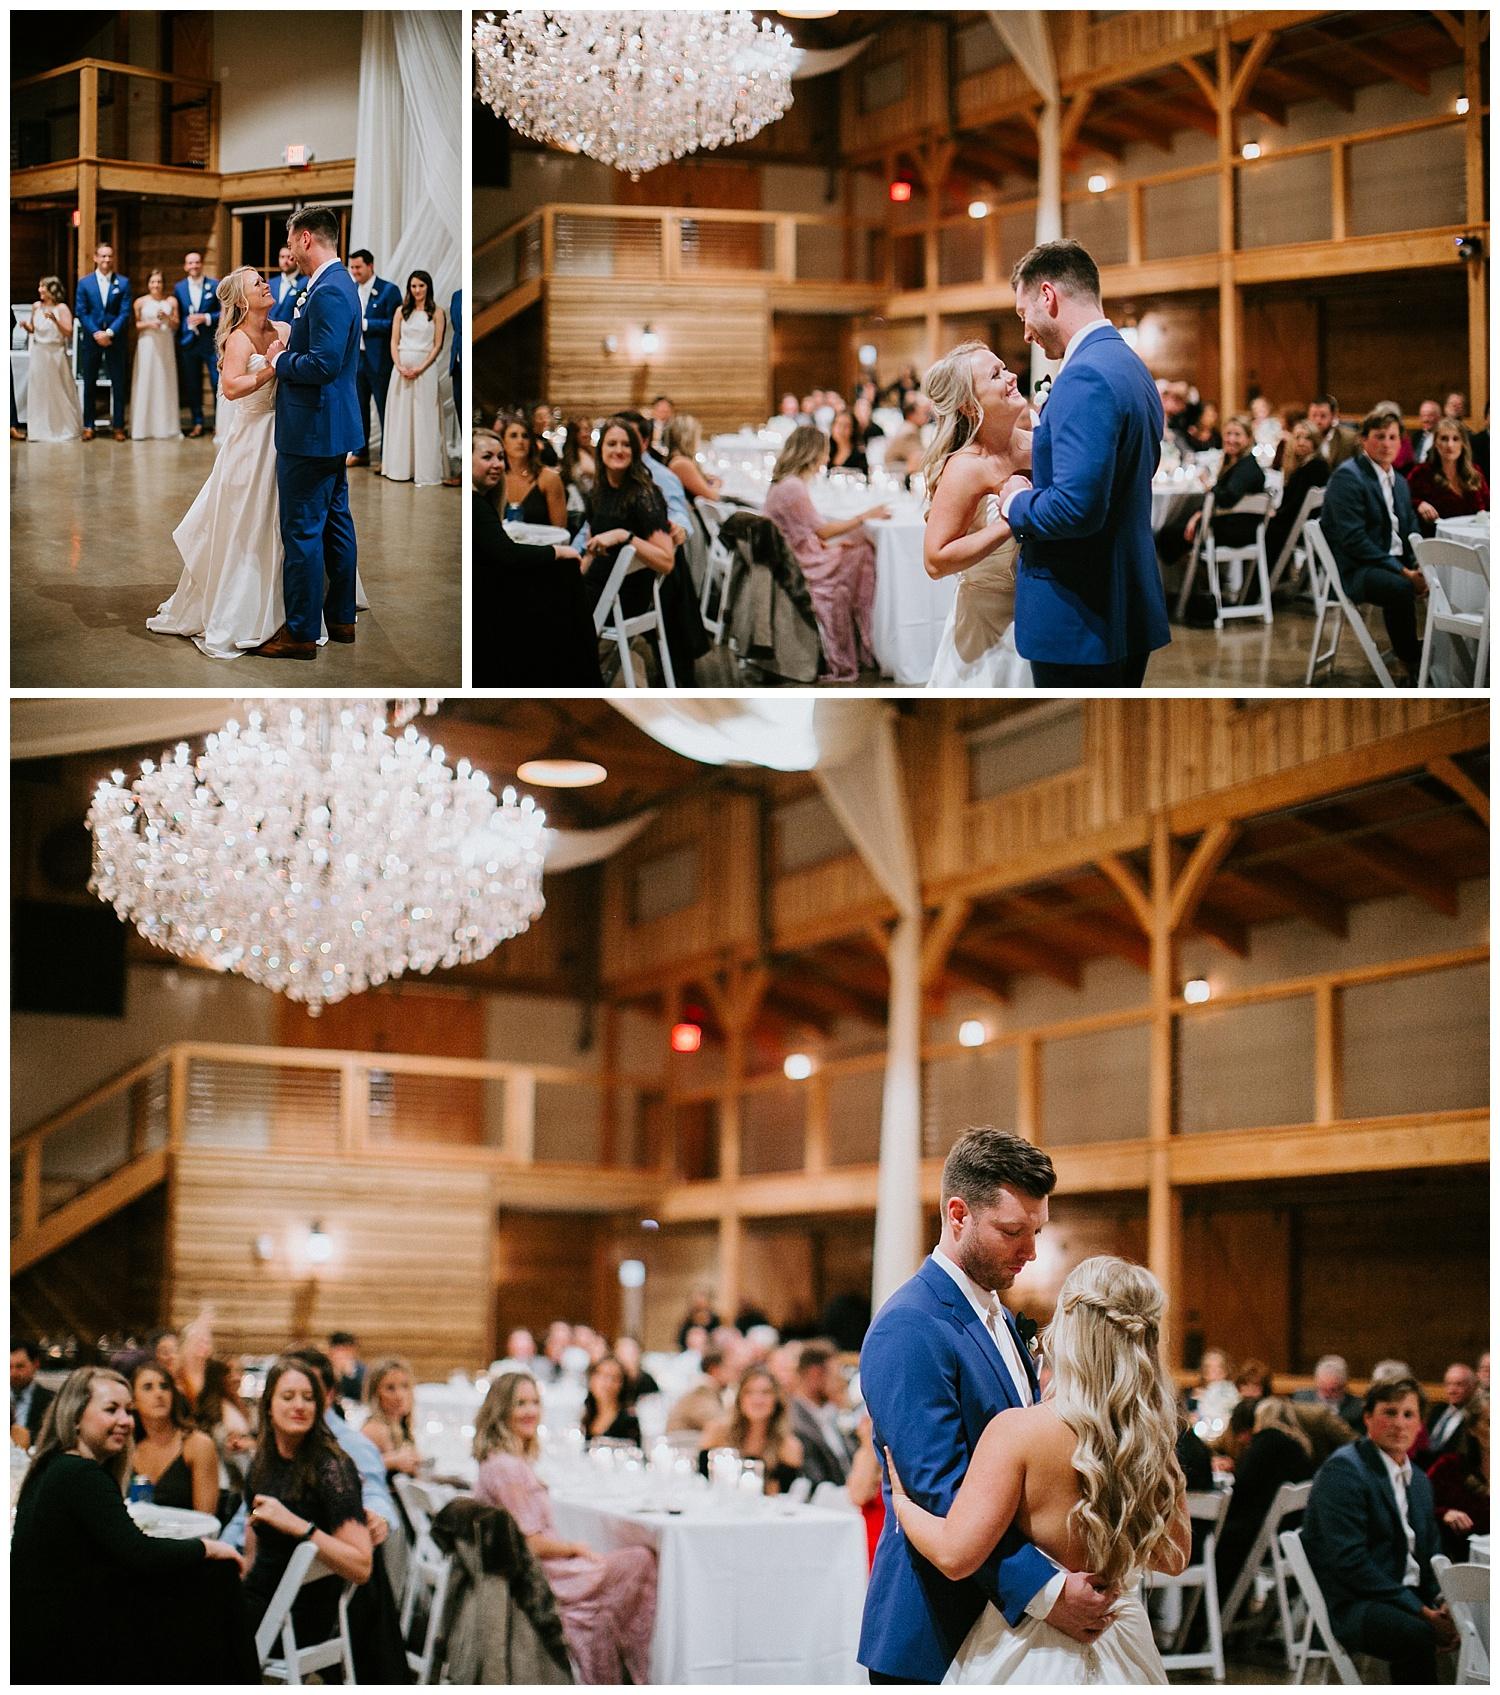 classy-wedding-sycamore_farms-nashville-tn2019-01-22_0076.jpg